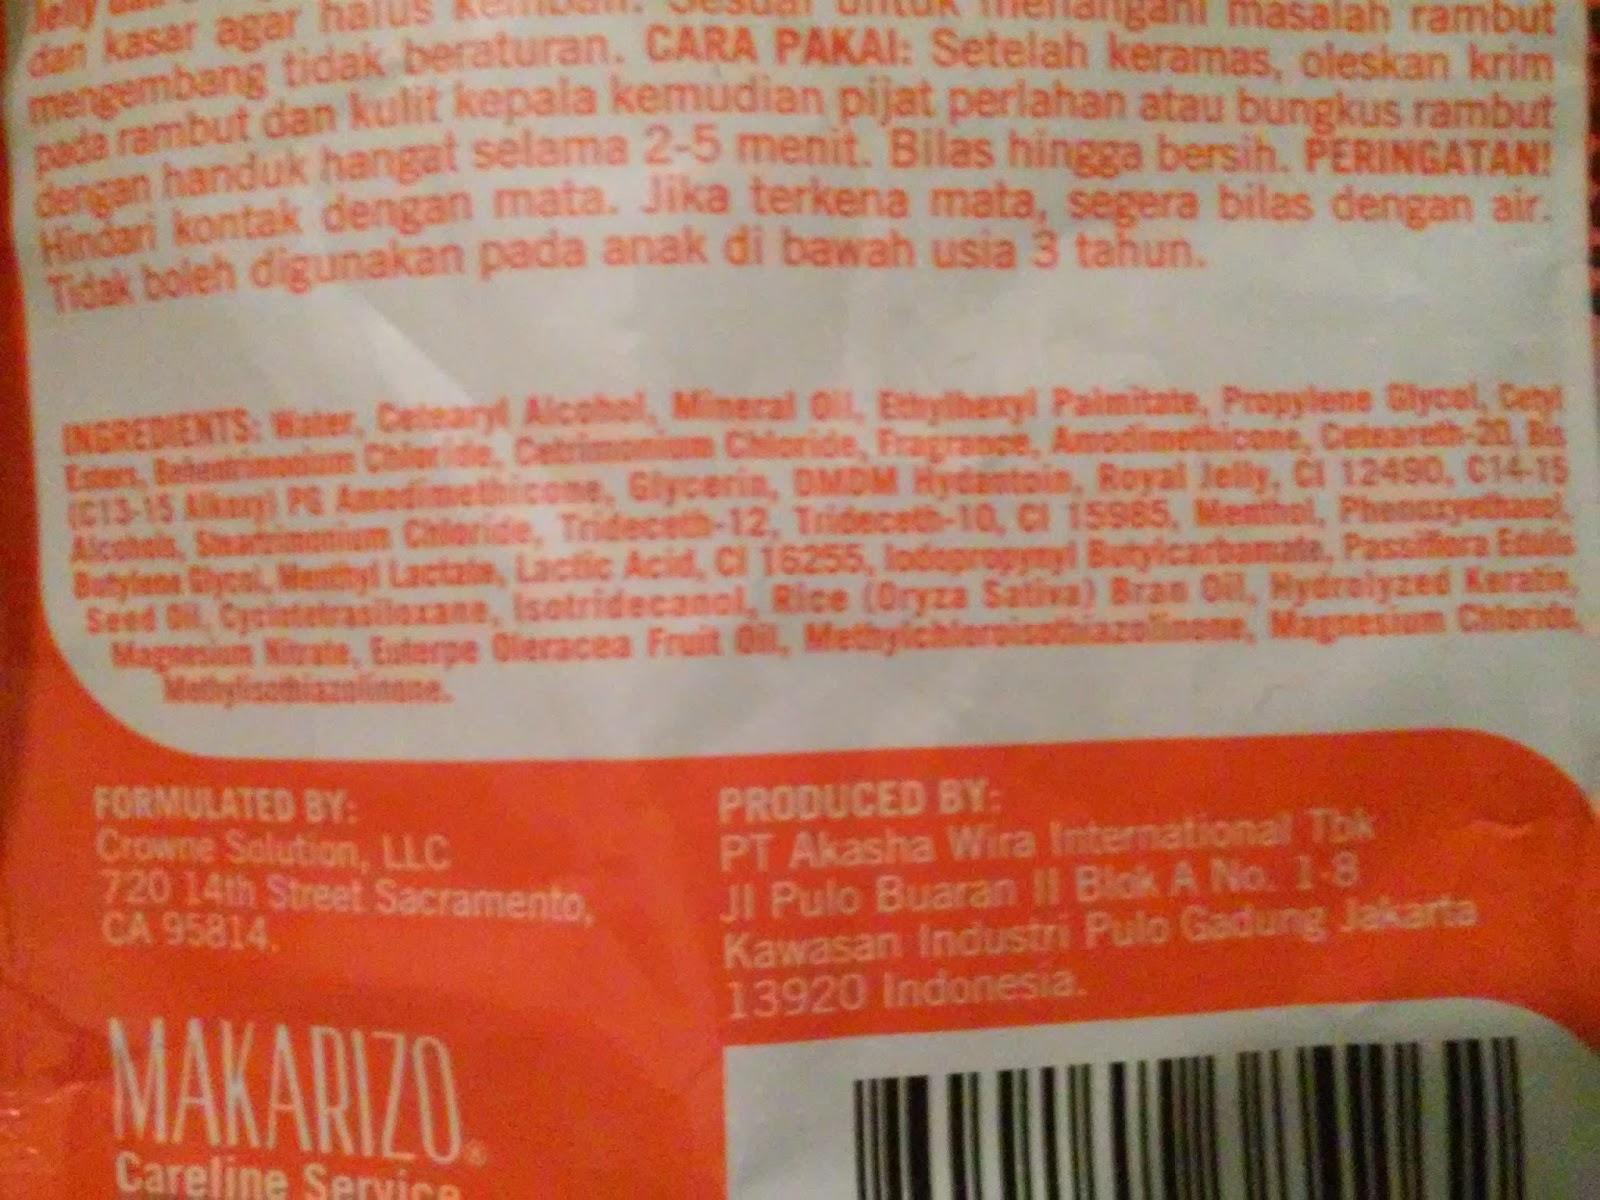 Makarizo Hair Energy Fibertherapy Royal Jelly Extract Scalp Creambath Aloe Ampamp Melon Sachet 30 Gr Review Cream